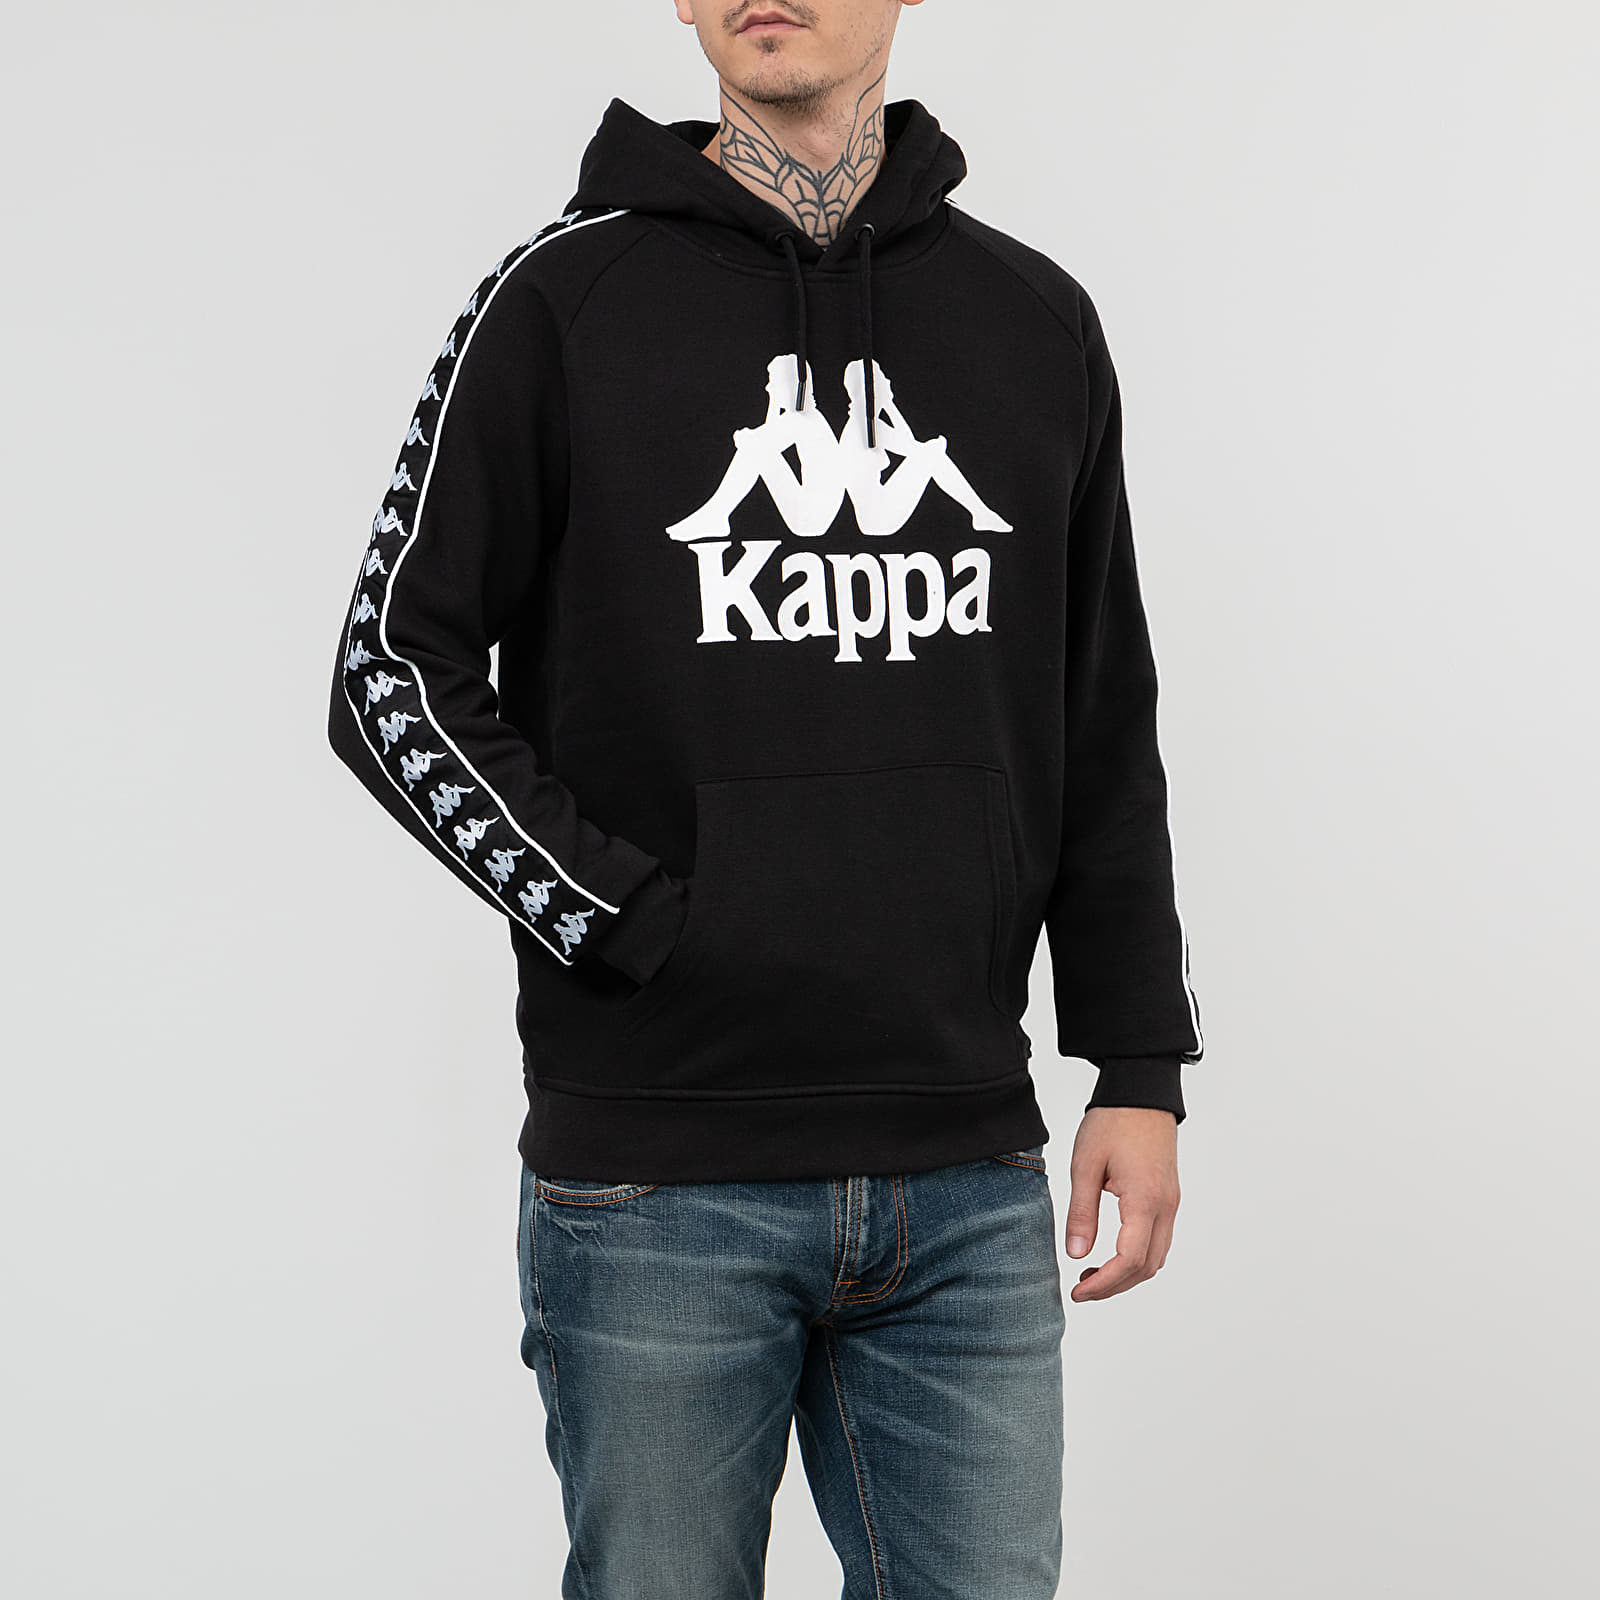 Kappa Authentic Hurtado Hoodie